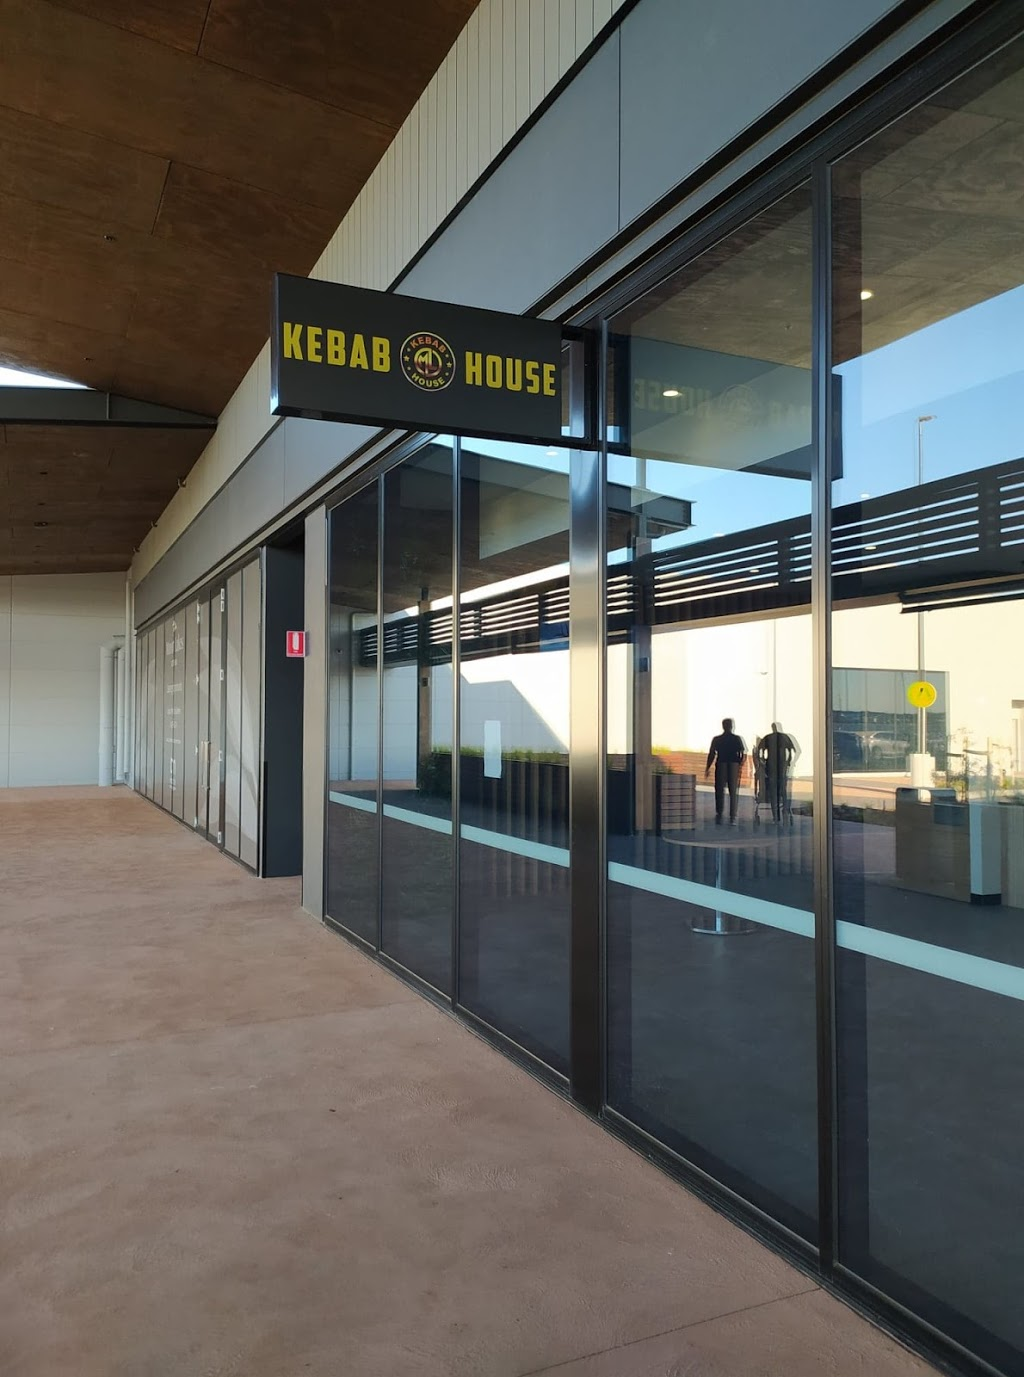 Manor Lakes Kebab House | restaurant | 455 Ballan Rd, Wyndham Vale VIC 3024, Australia | 0450917617 OR +61 450 917 617